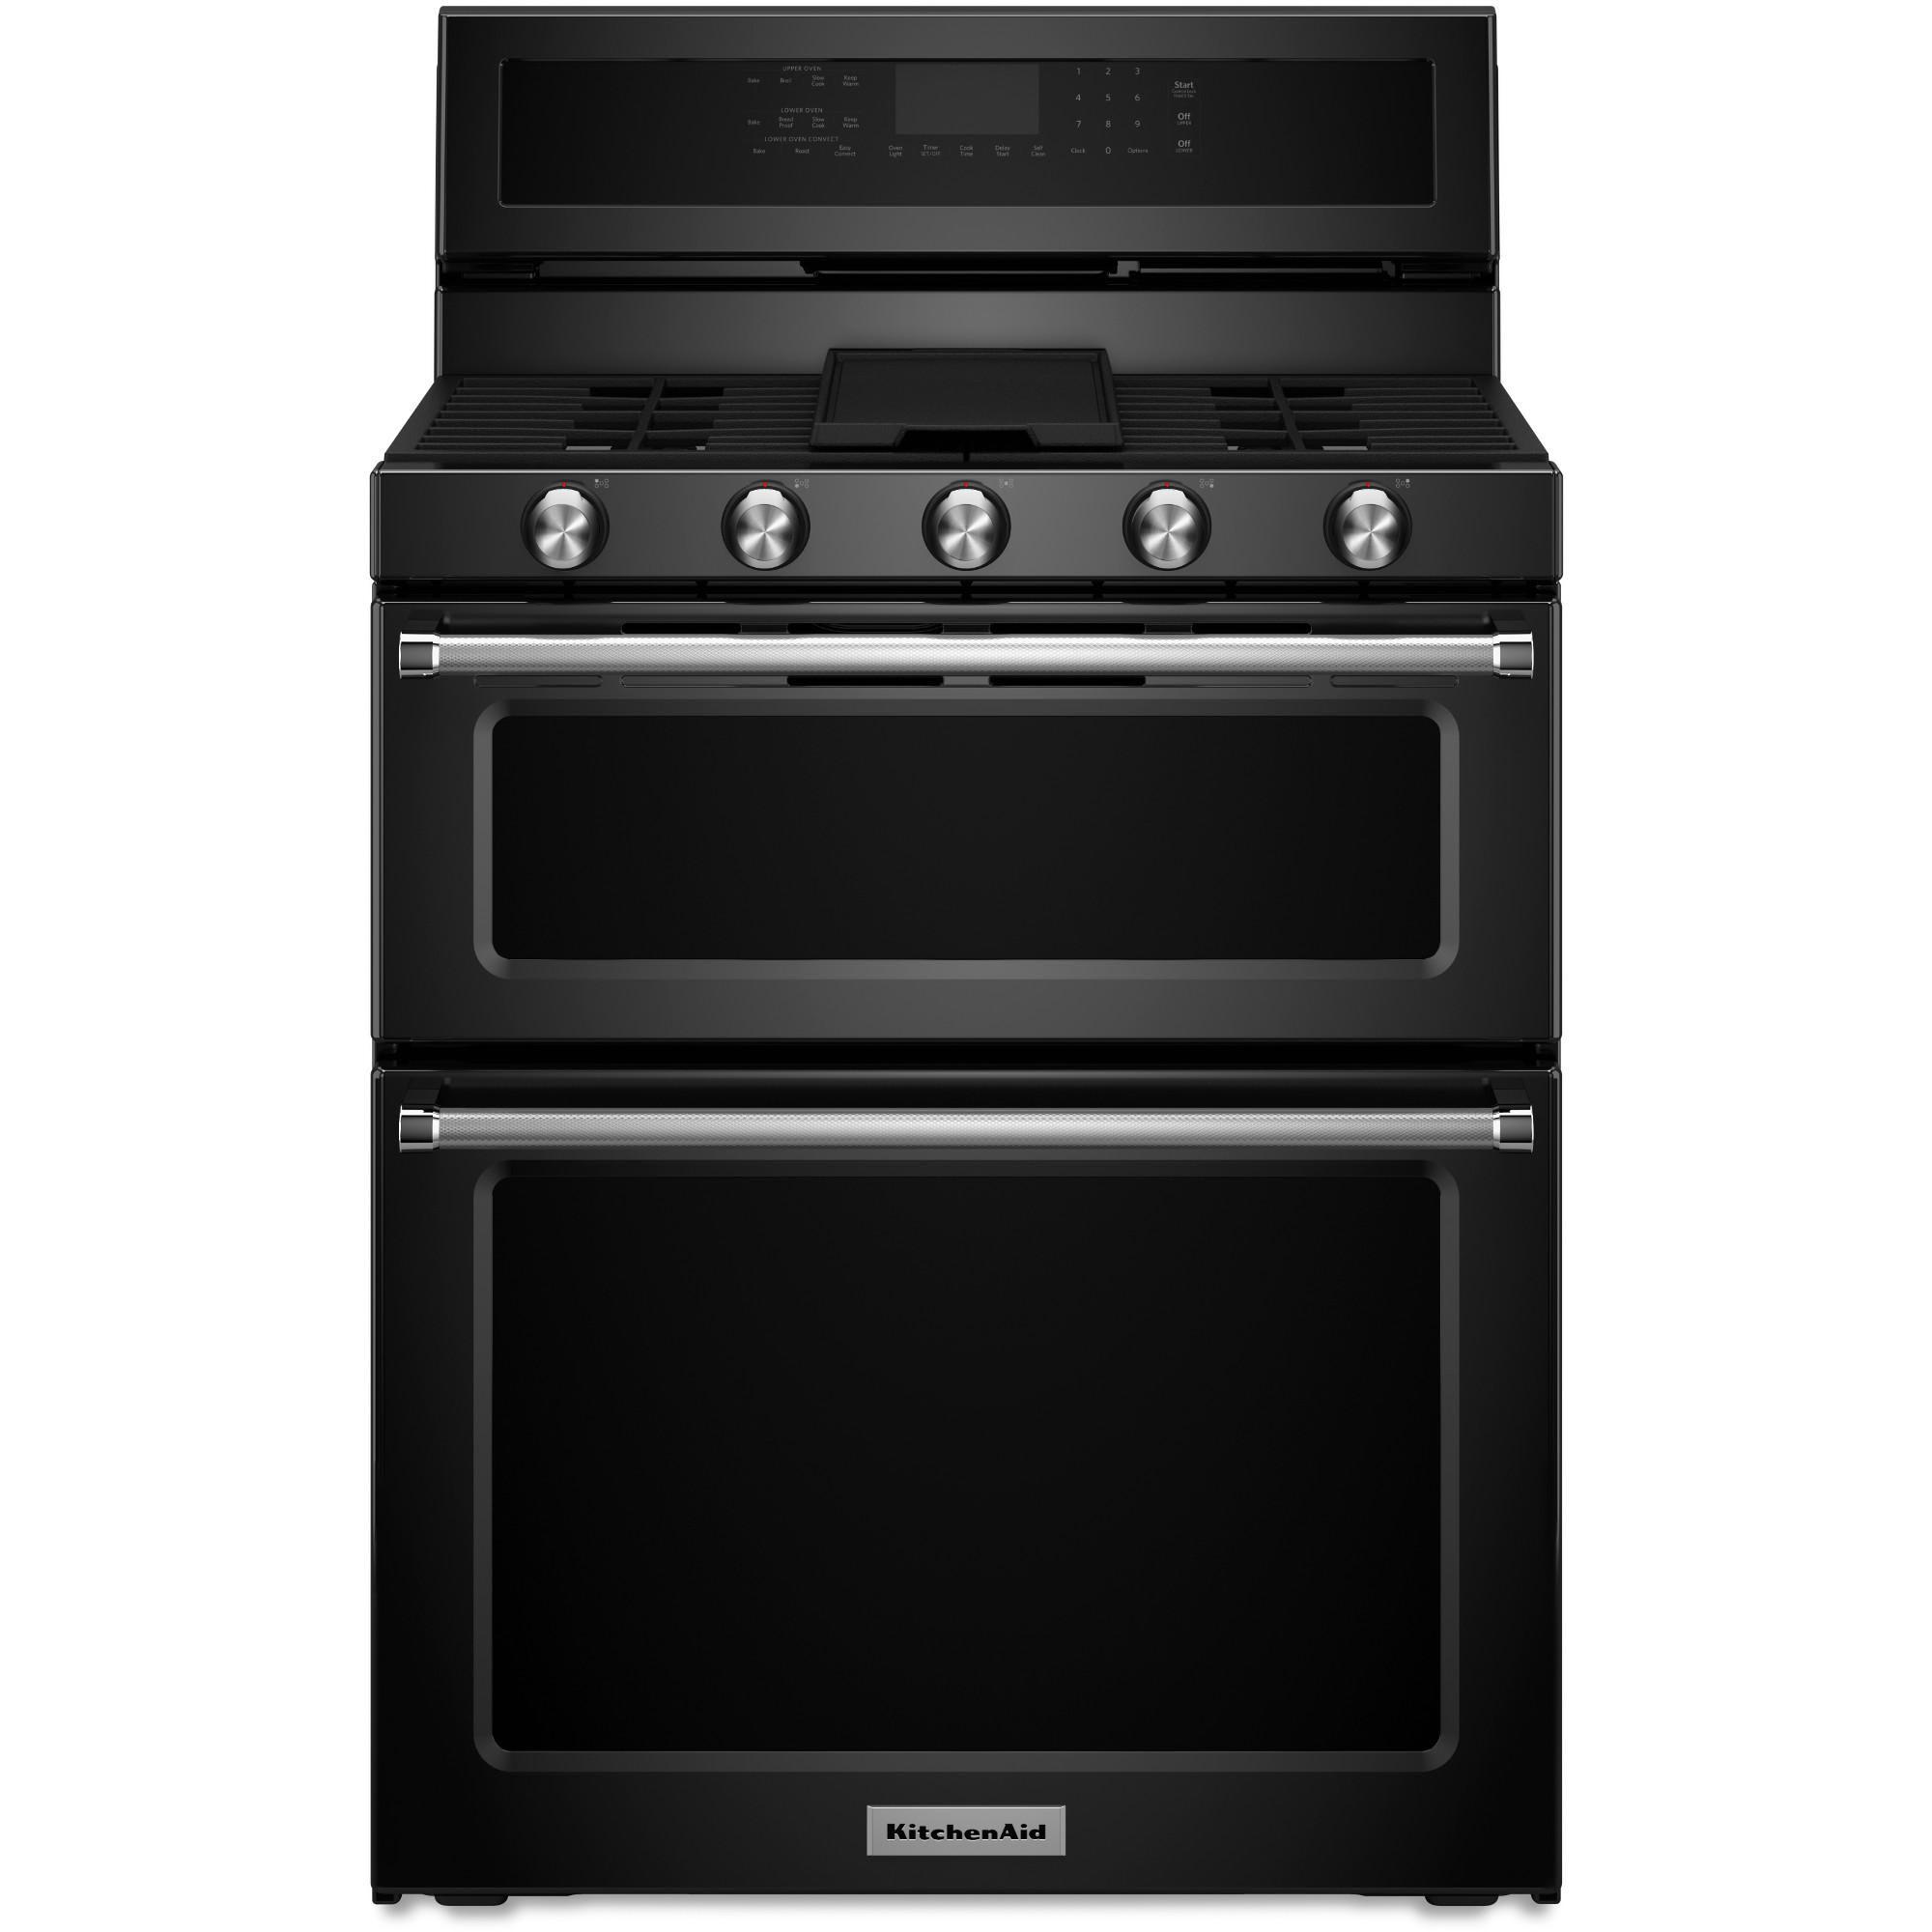 KitchenAid - KFGD500EBL - 6.0 cu. ft. 5-Burner Gas Double ...